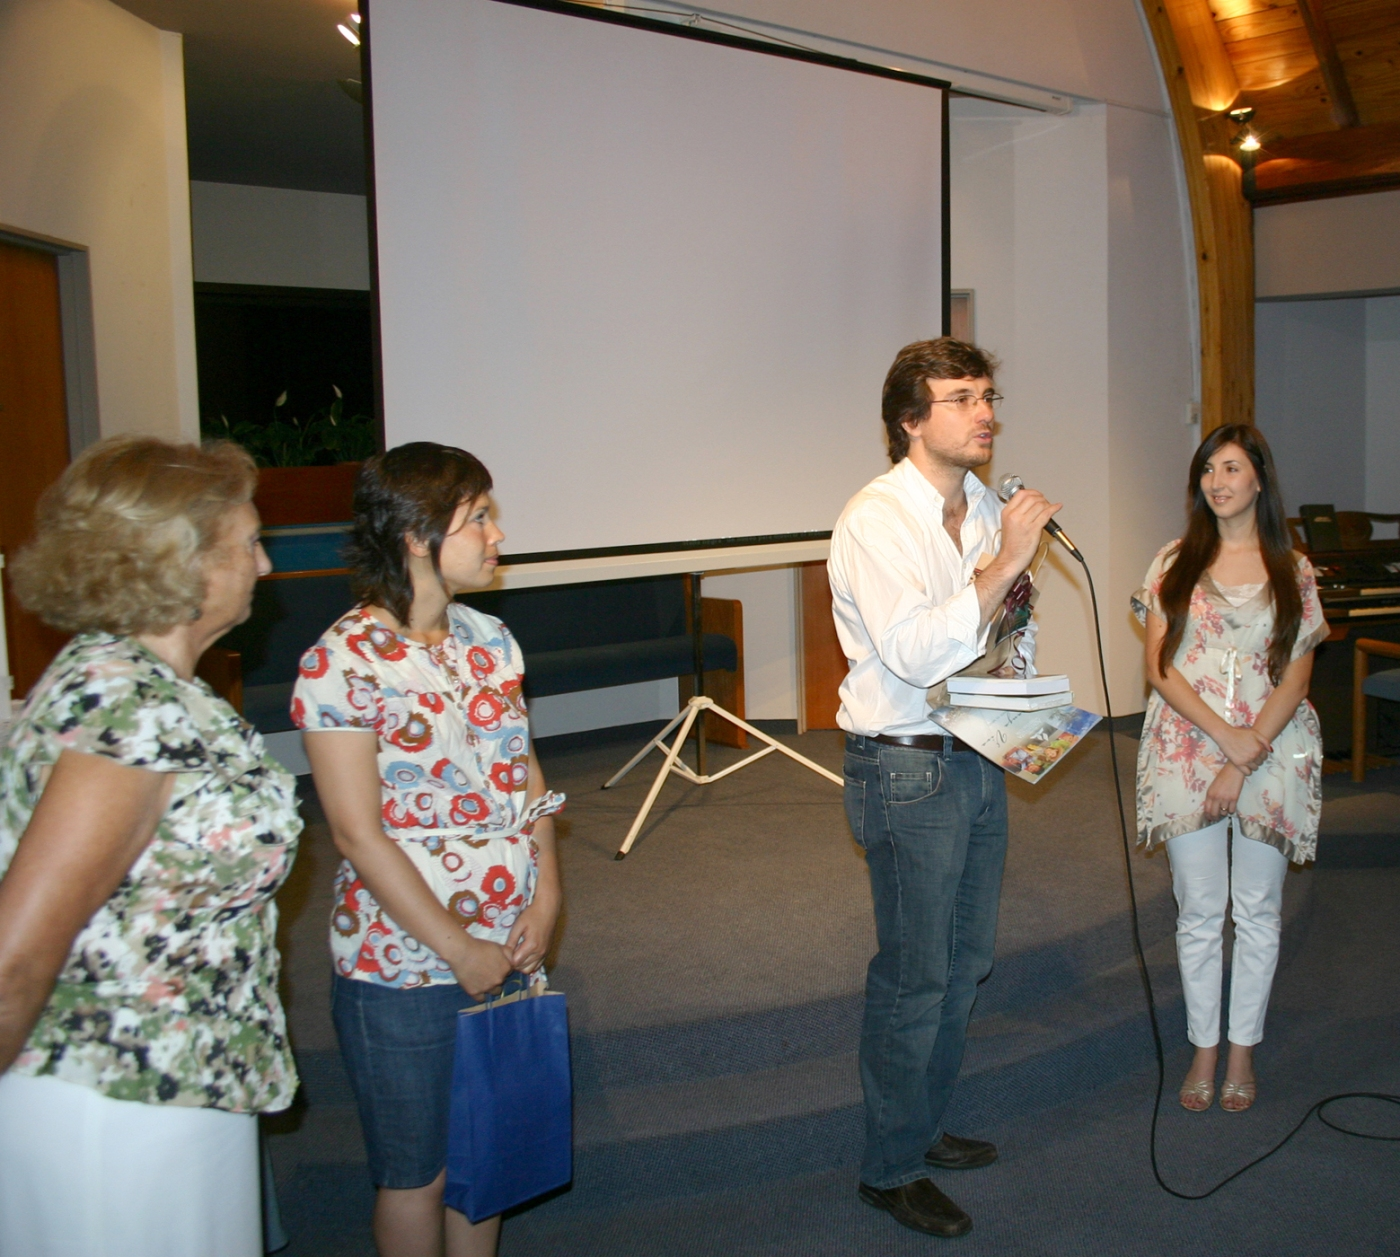 Int. Lucas Ghi, Beatriz Rosenblet y Virgina Vargas